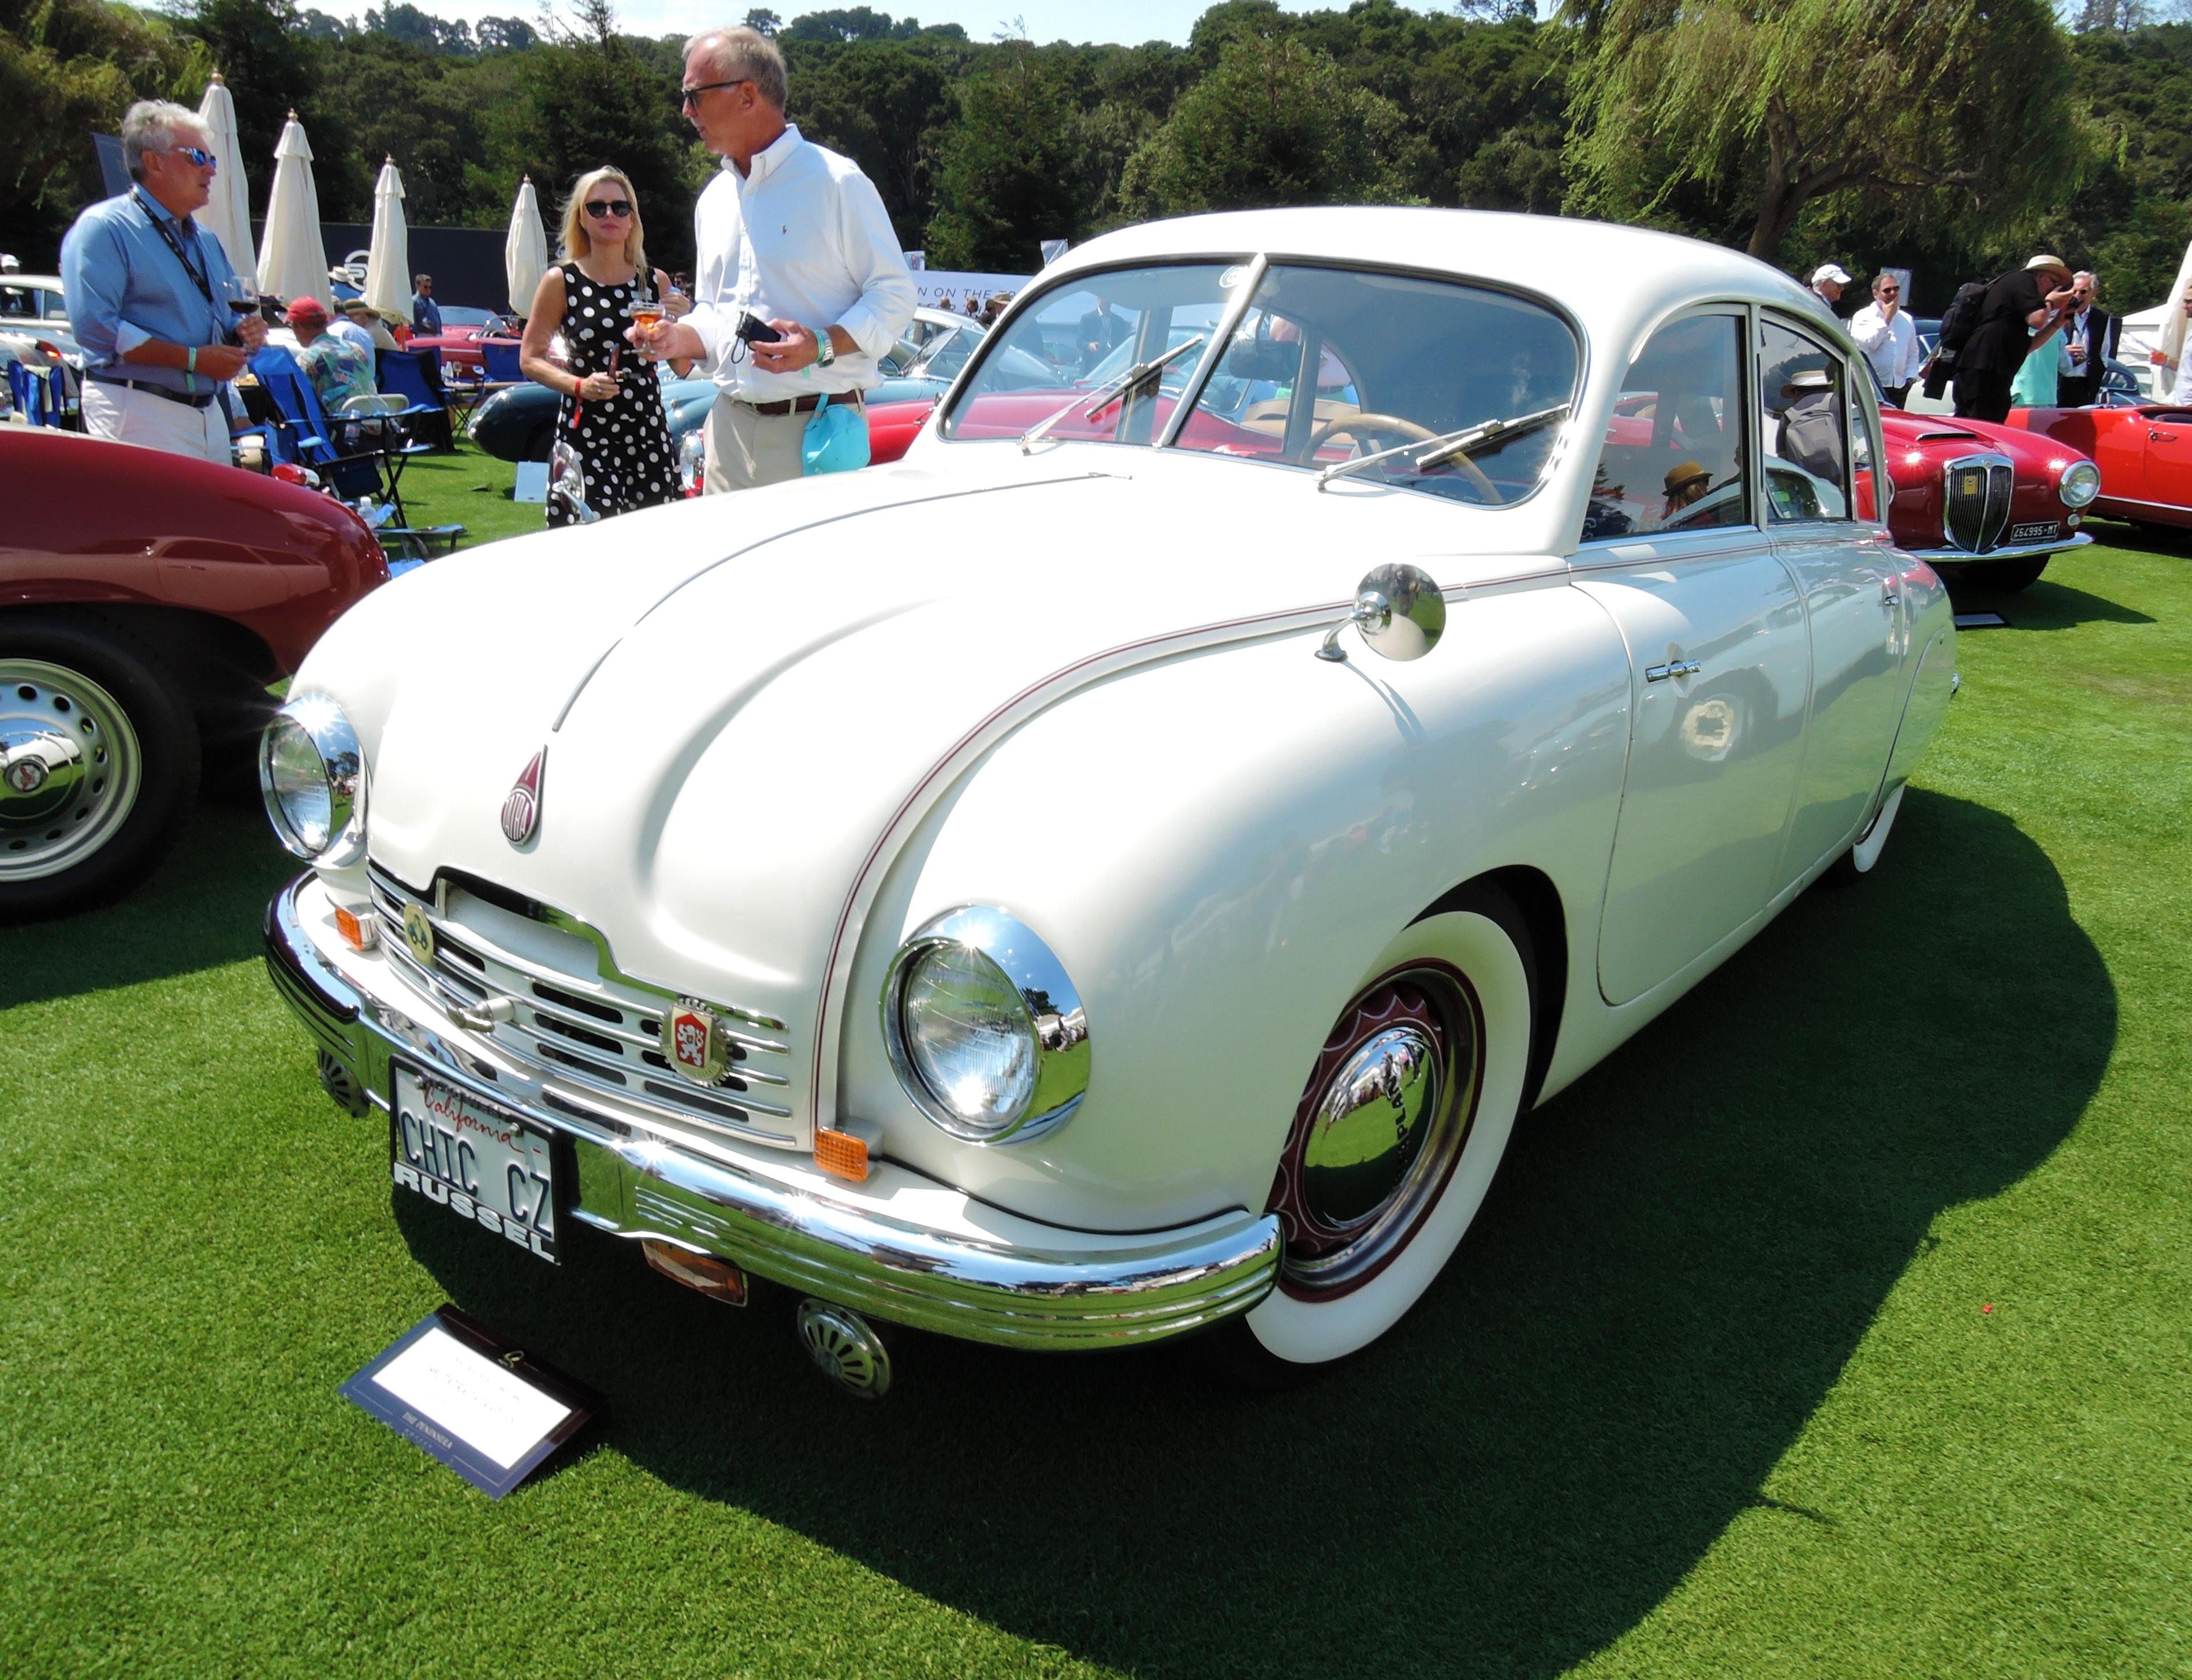 white 1951 Tatra Tatraplan - The Quail 2017